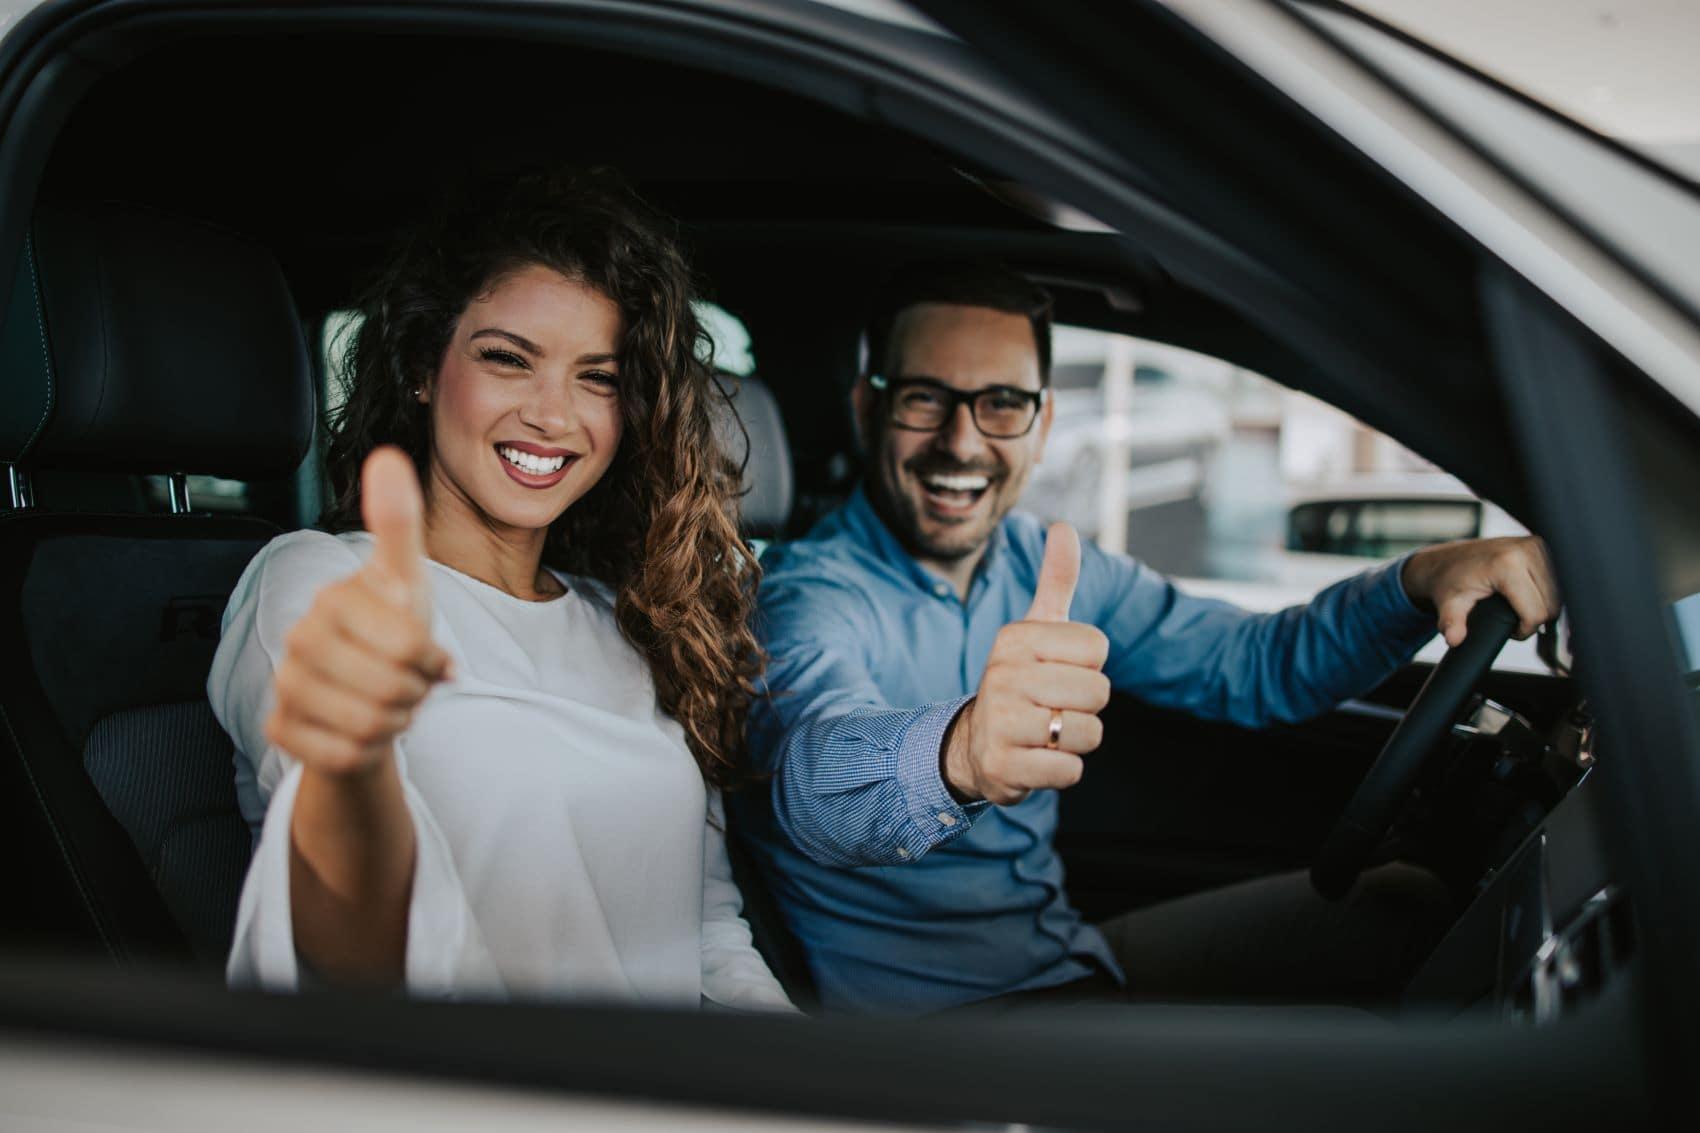 A couple inside a rental car